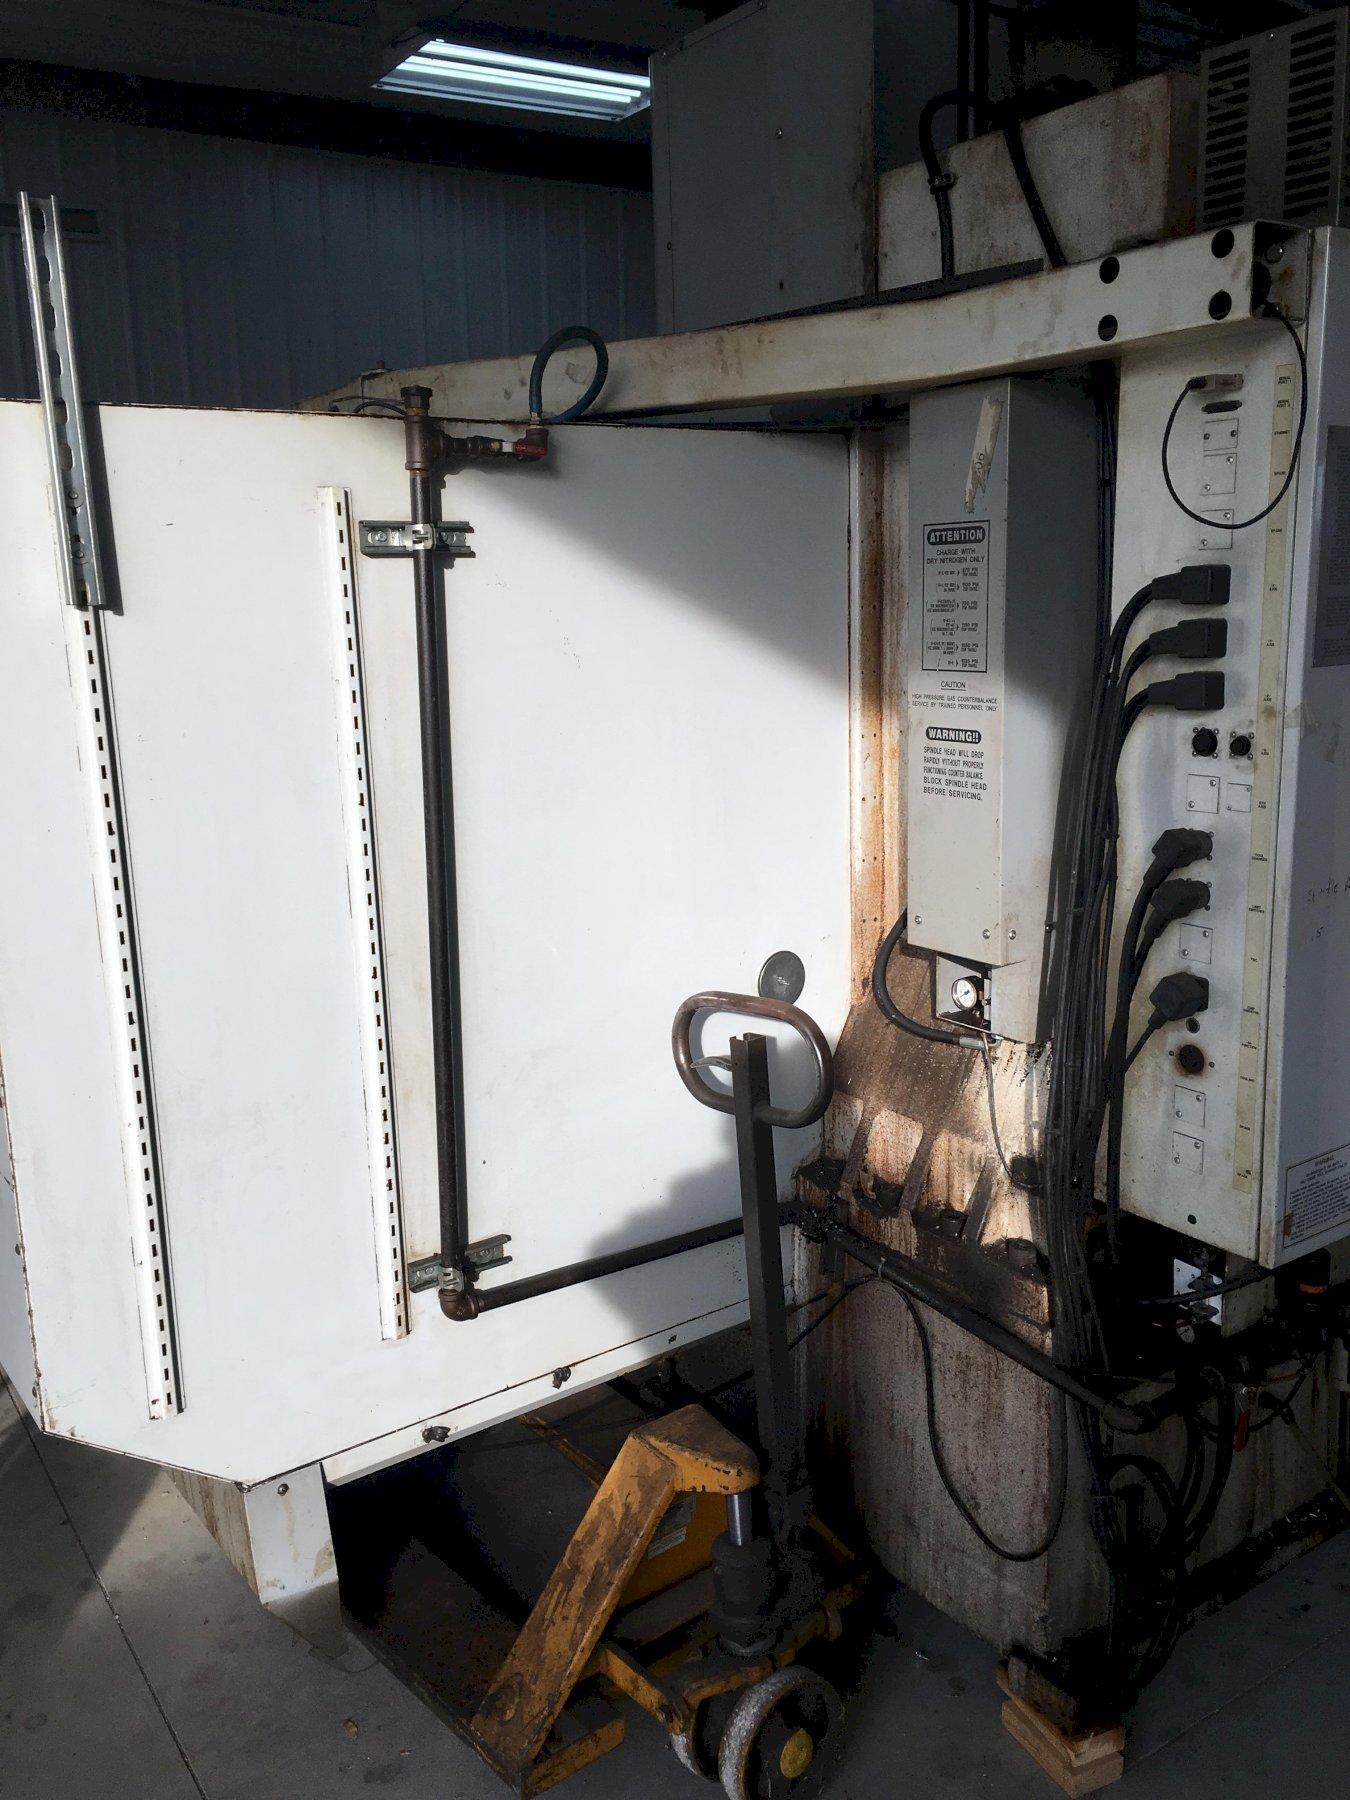 10,000 RPM HAAS Model #VF5 Vertical CNC Machining Center